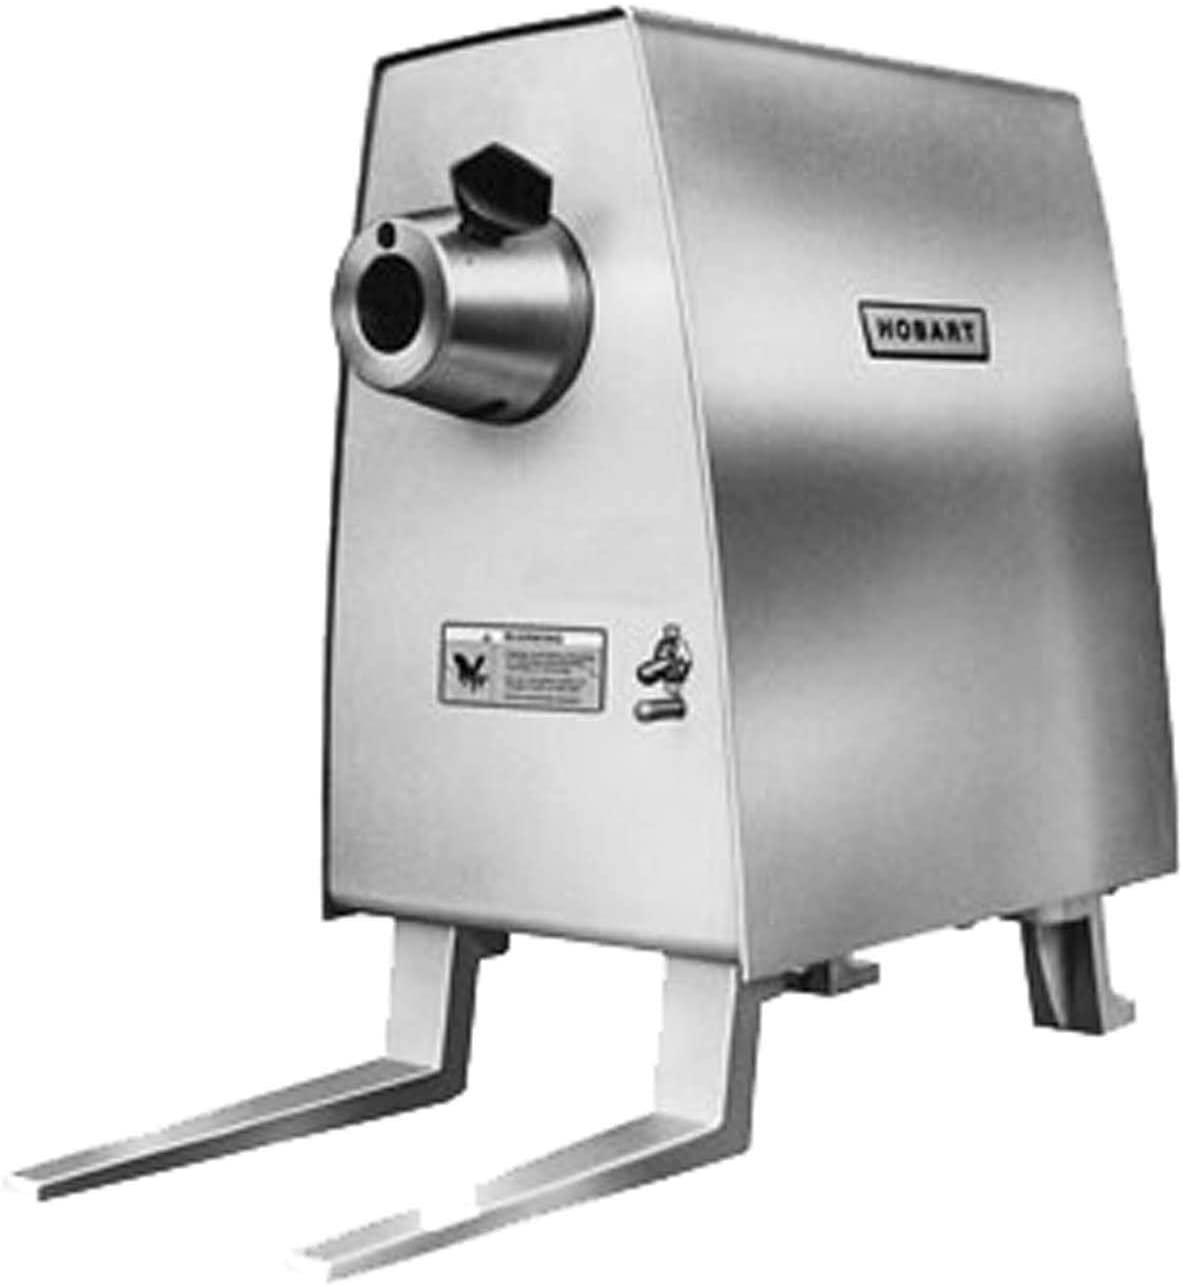 Hobart PD-70 Power Drive Unit for Vegetable Slicer 700-RPM Drive 120V